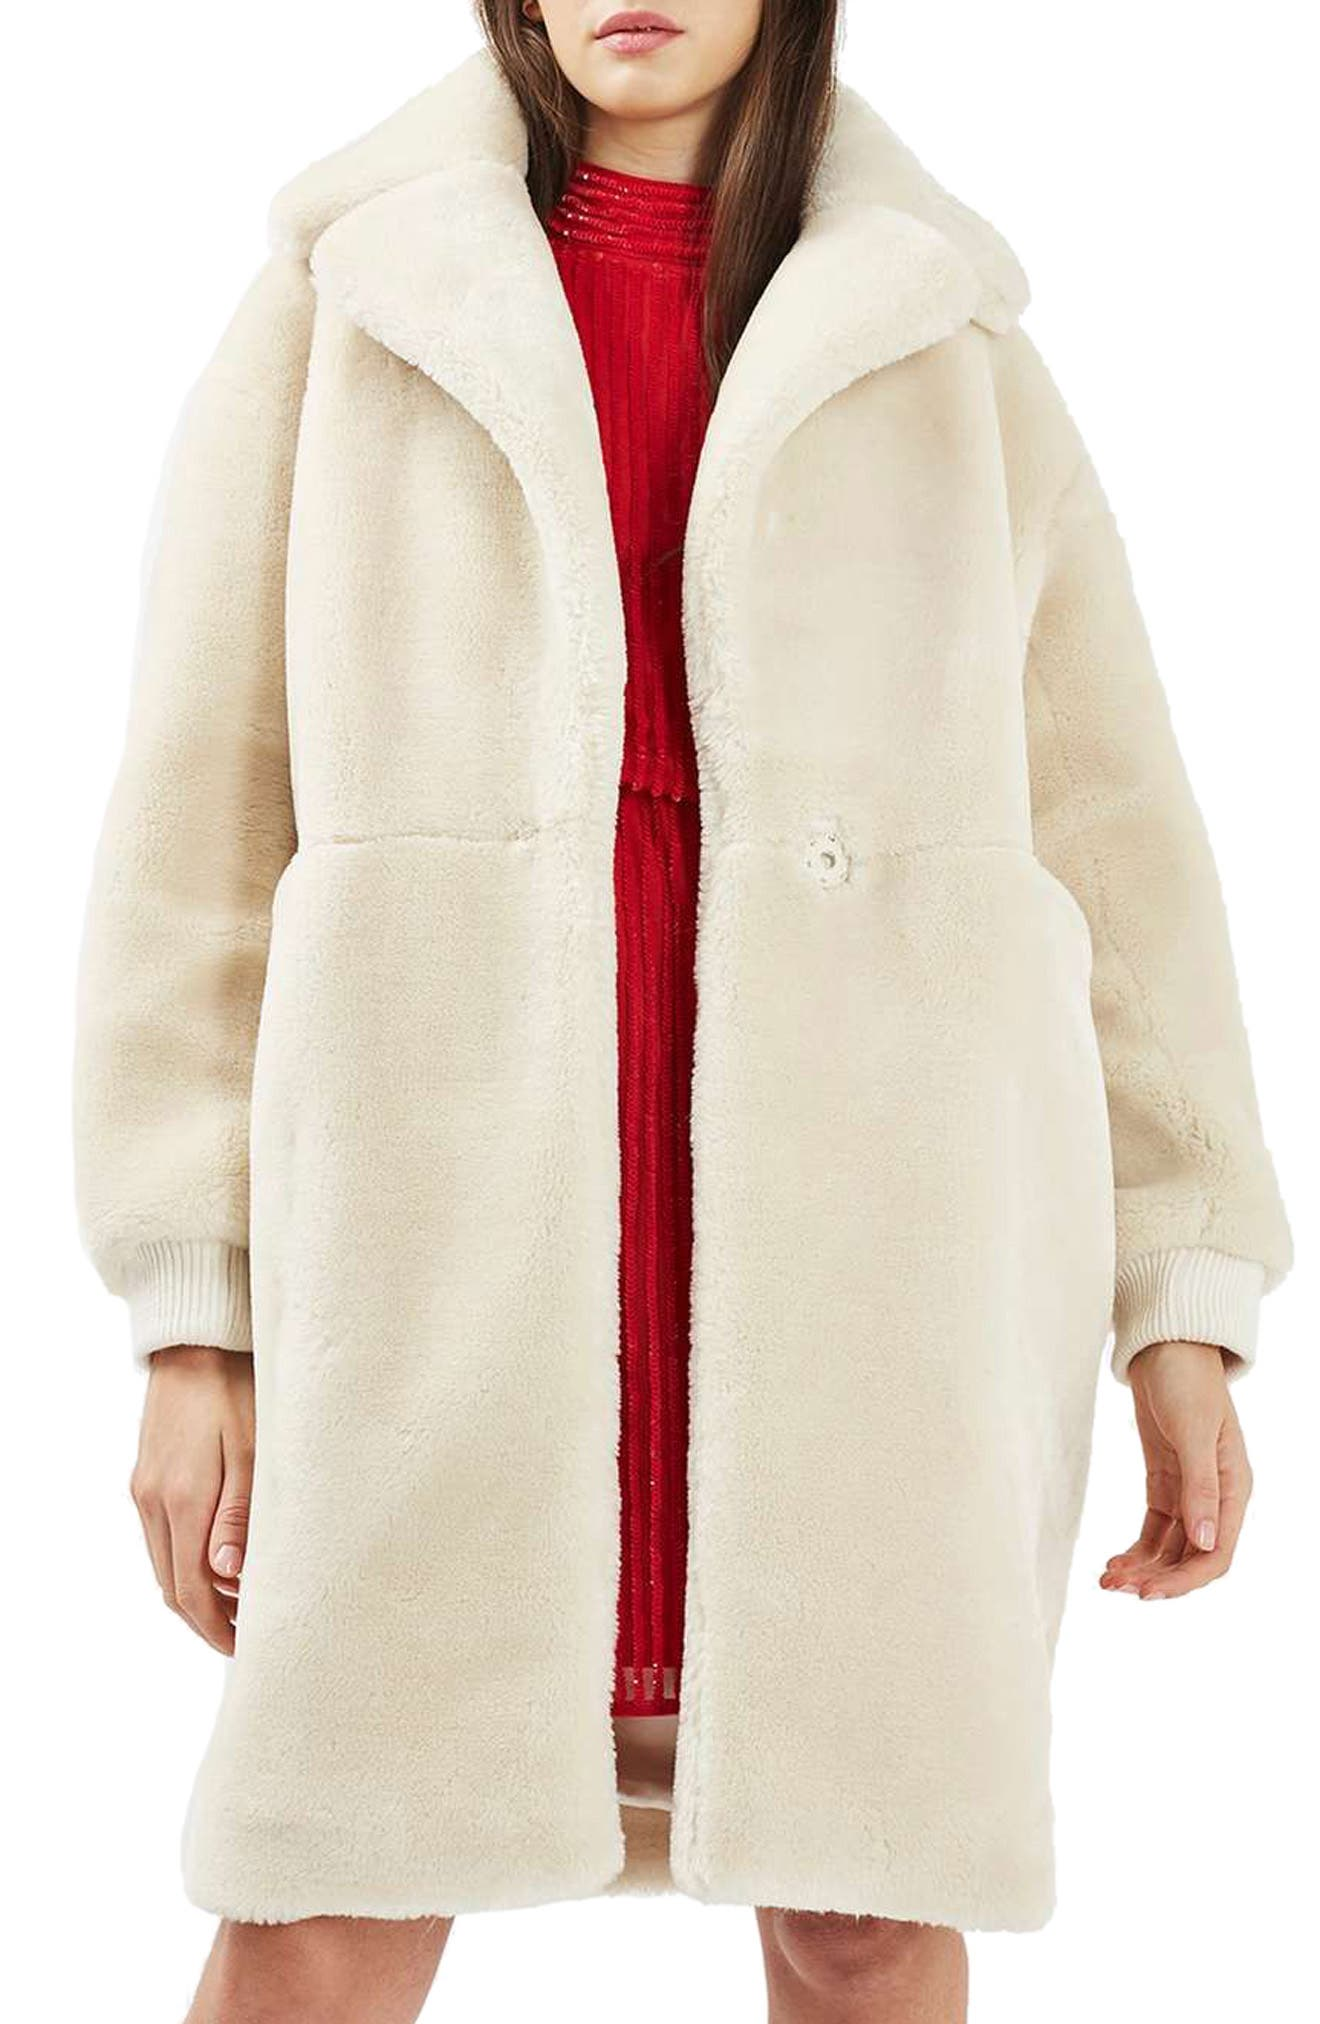 TOPSHOP,                             Polar Bear Faux Fur Coat,                             Main thumbnail 1, color,                             900